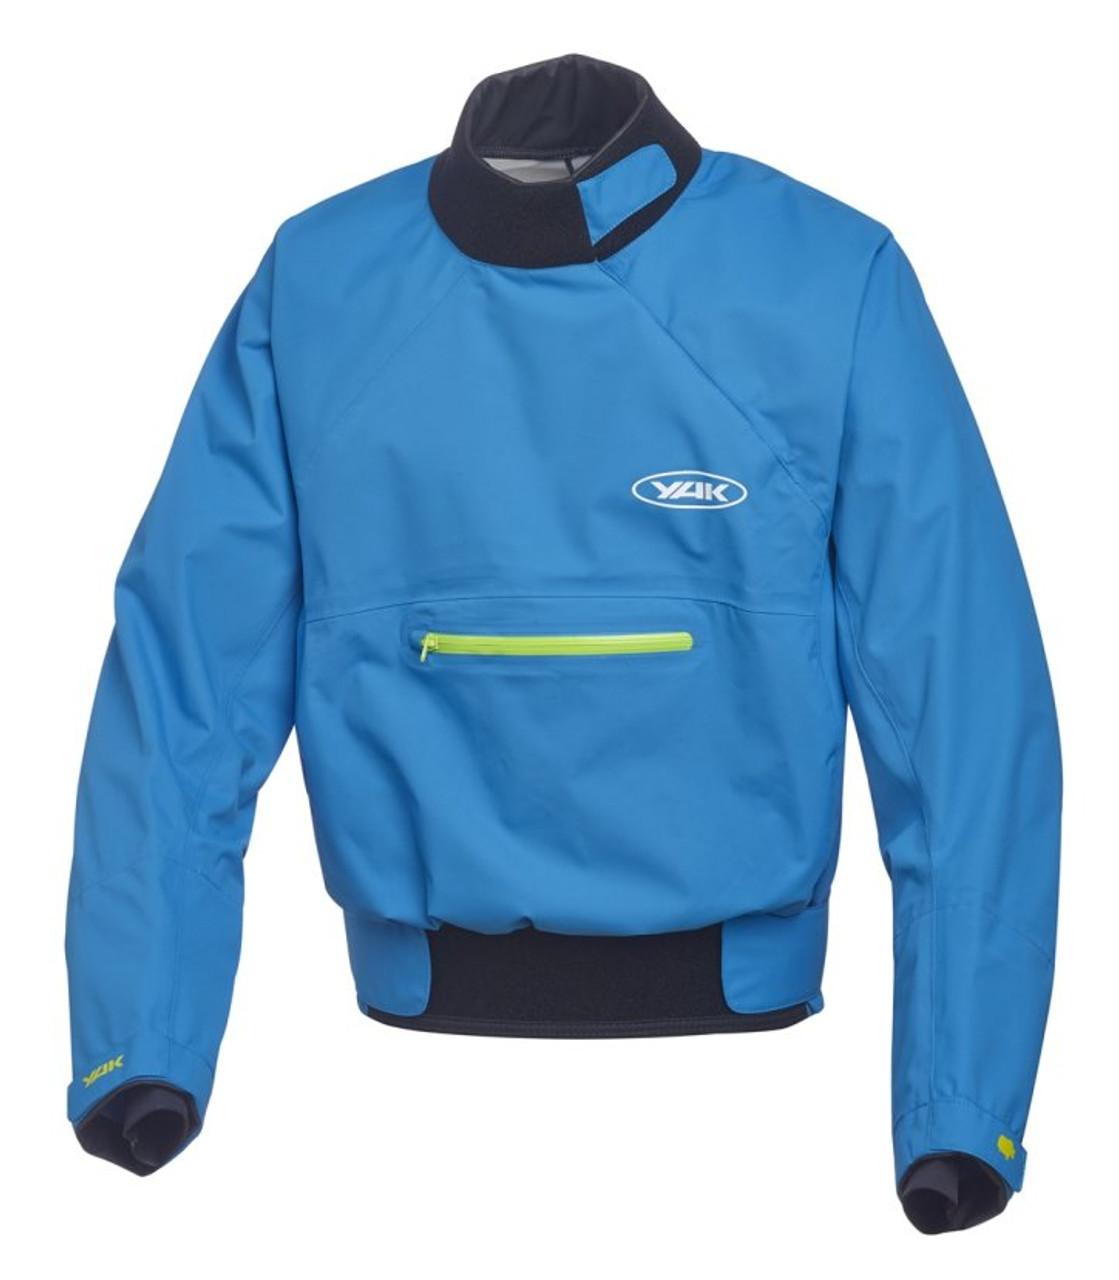 YAK Sumit kayak and canoe jacket in blue